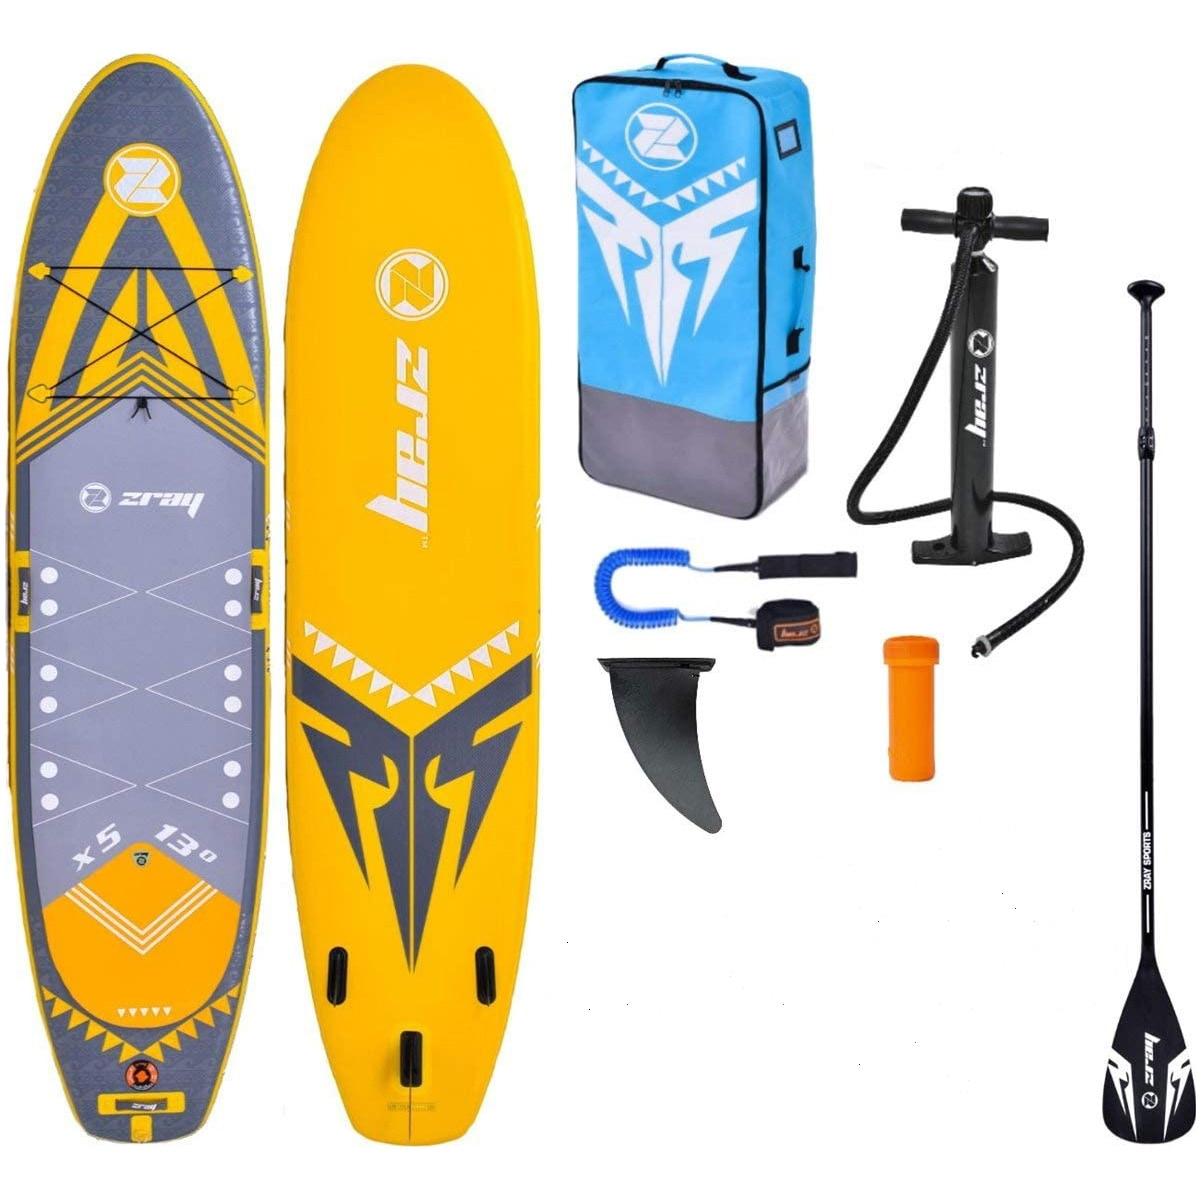 "Fotografie Set placa gonflabila Stand Up PaddleBoard Z-RAY X-Rider X5 XL 13"", camera dubla, 396*91*15 cm, cu pompa si sac pentru transport incluse"